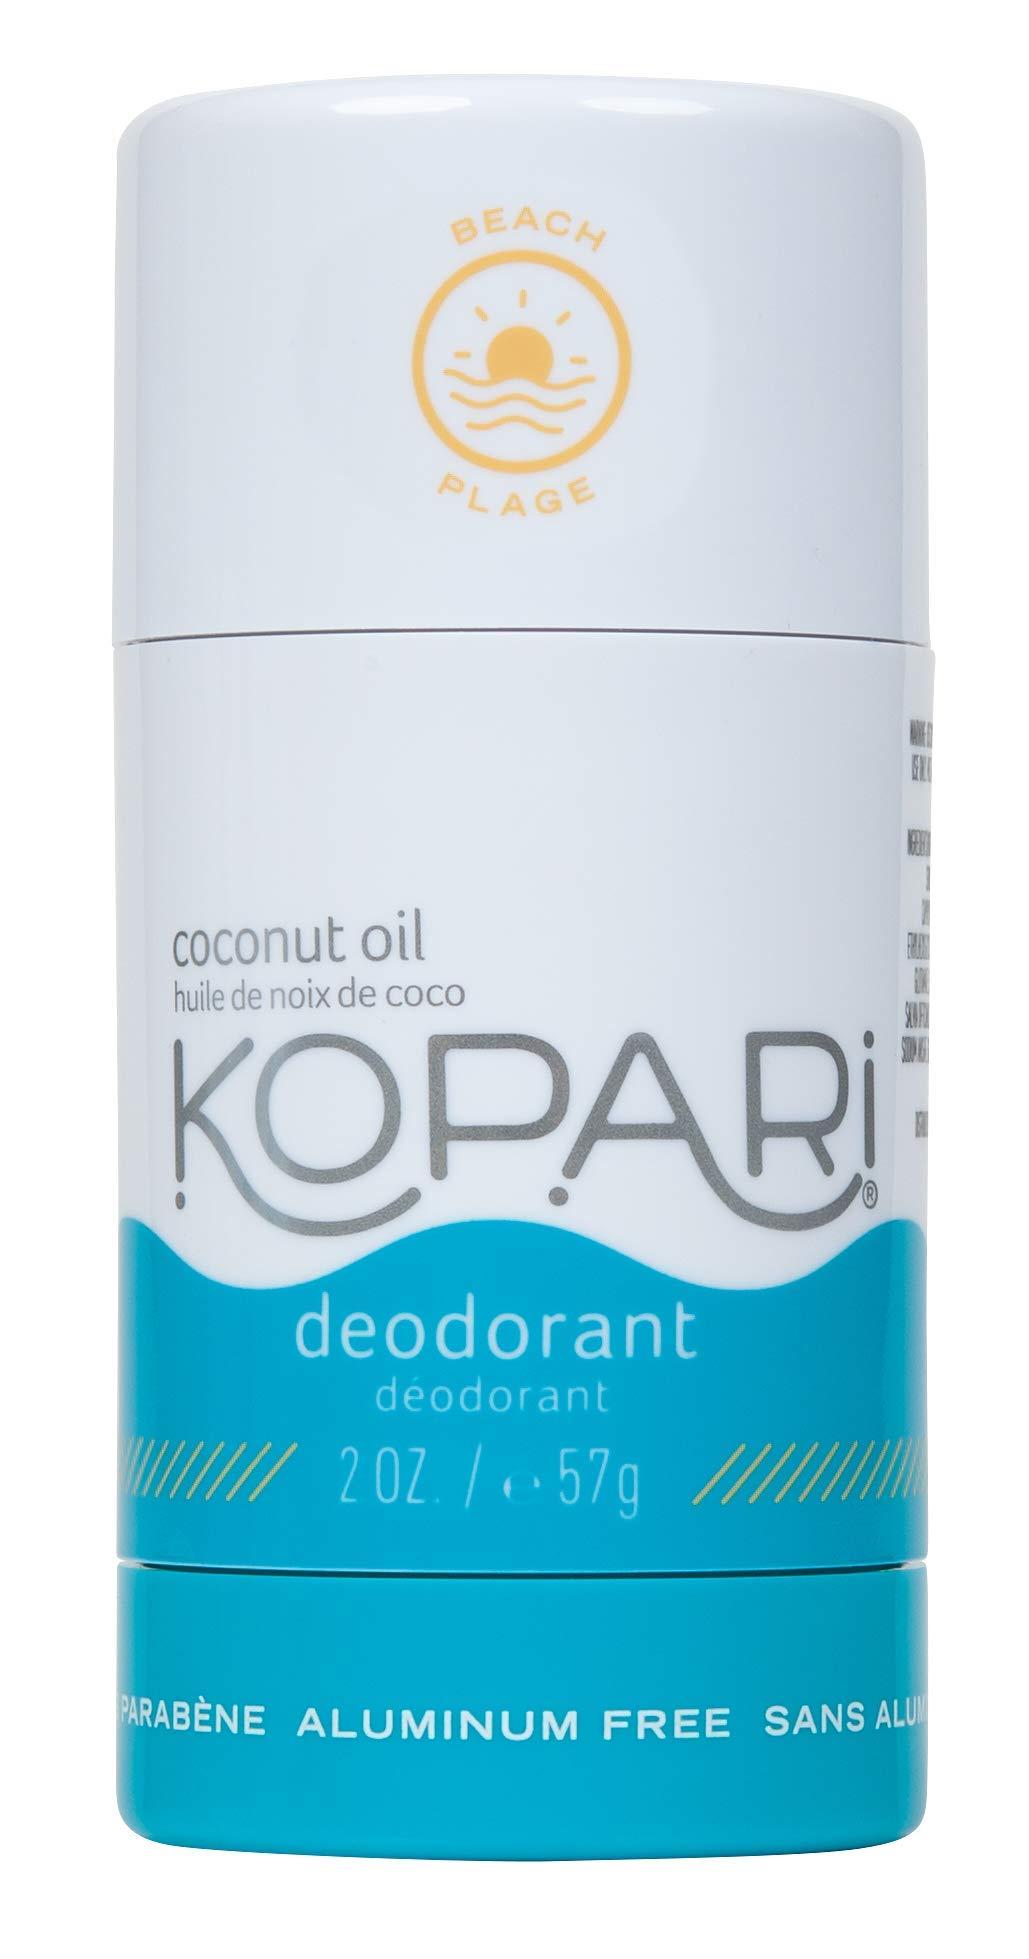 Kopari Aluminum-Free Deodorant Beach   Non-Toxic, Paraben Free, Gluten Free & Cruelty Free Men's and Women's Deodorant   Made with Organic Coconut Oil   2.0 oz